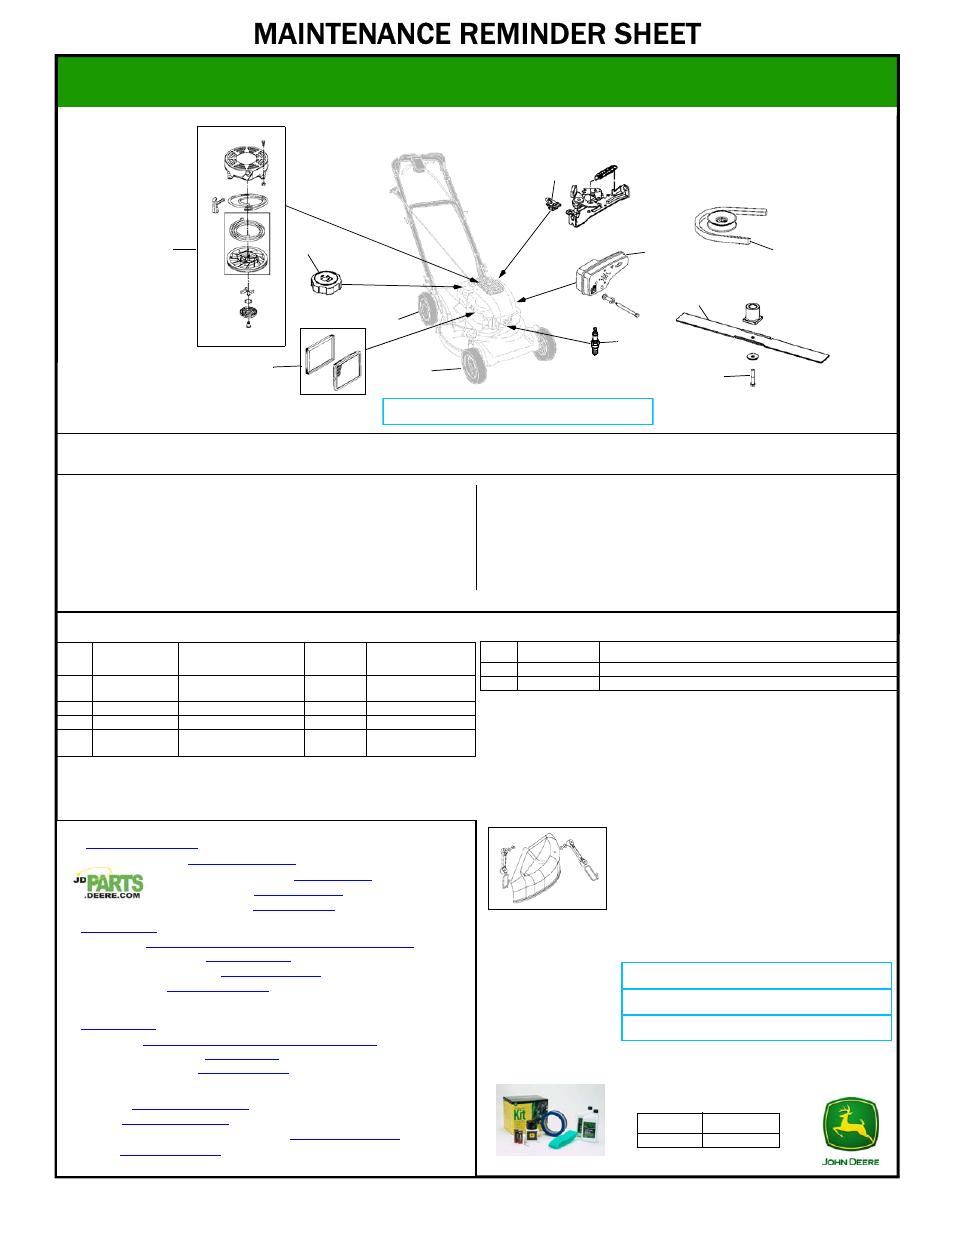 John Deere JS26 User Manual   1 page